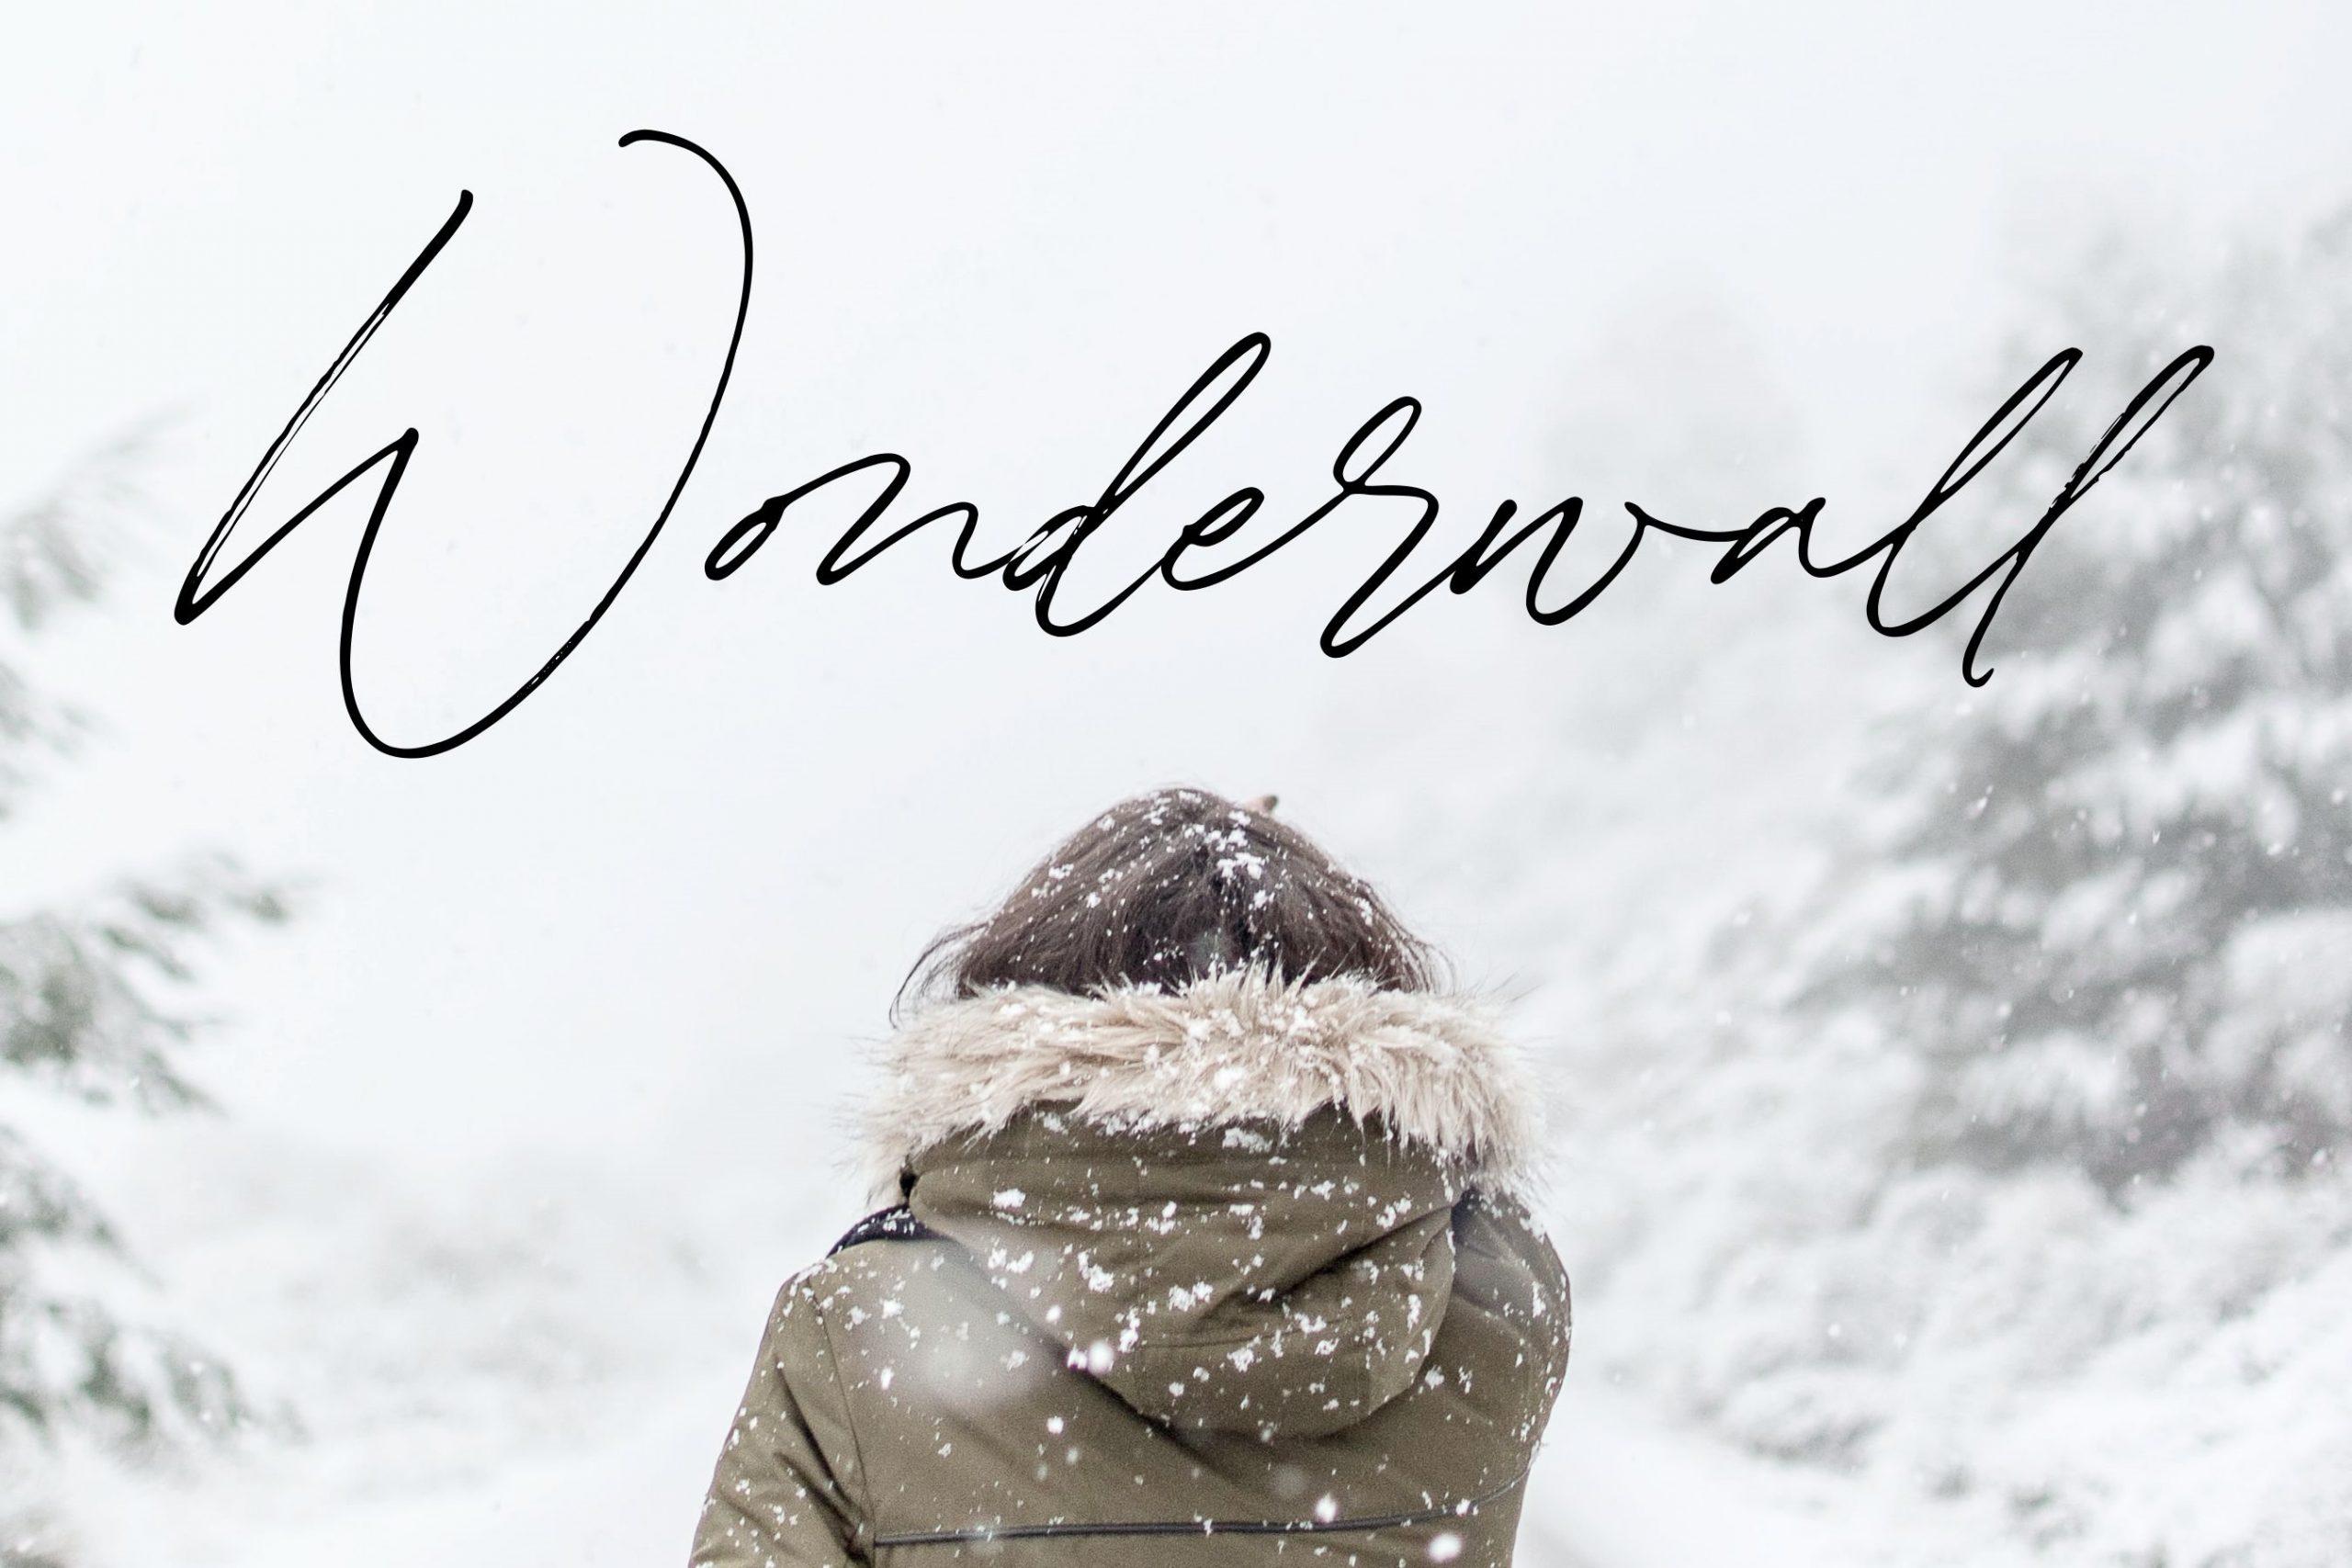 Winterlady3